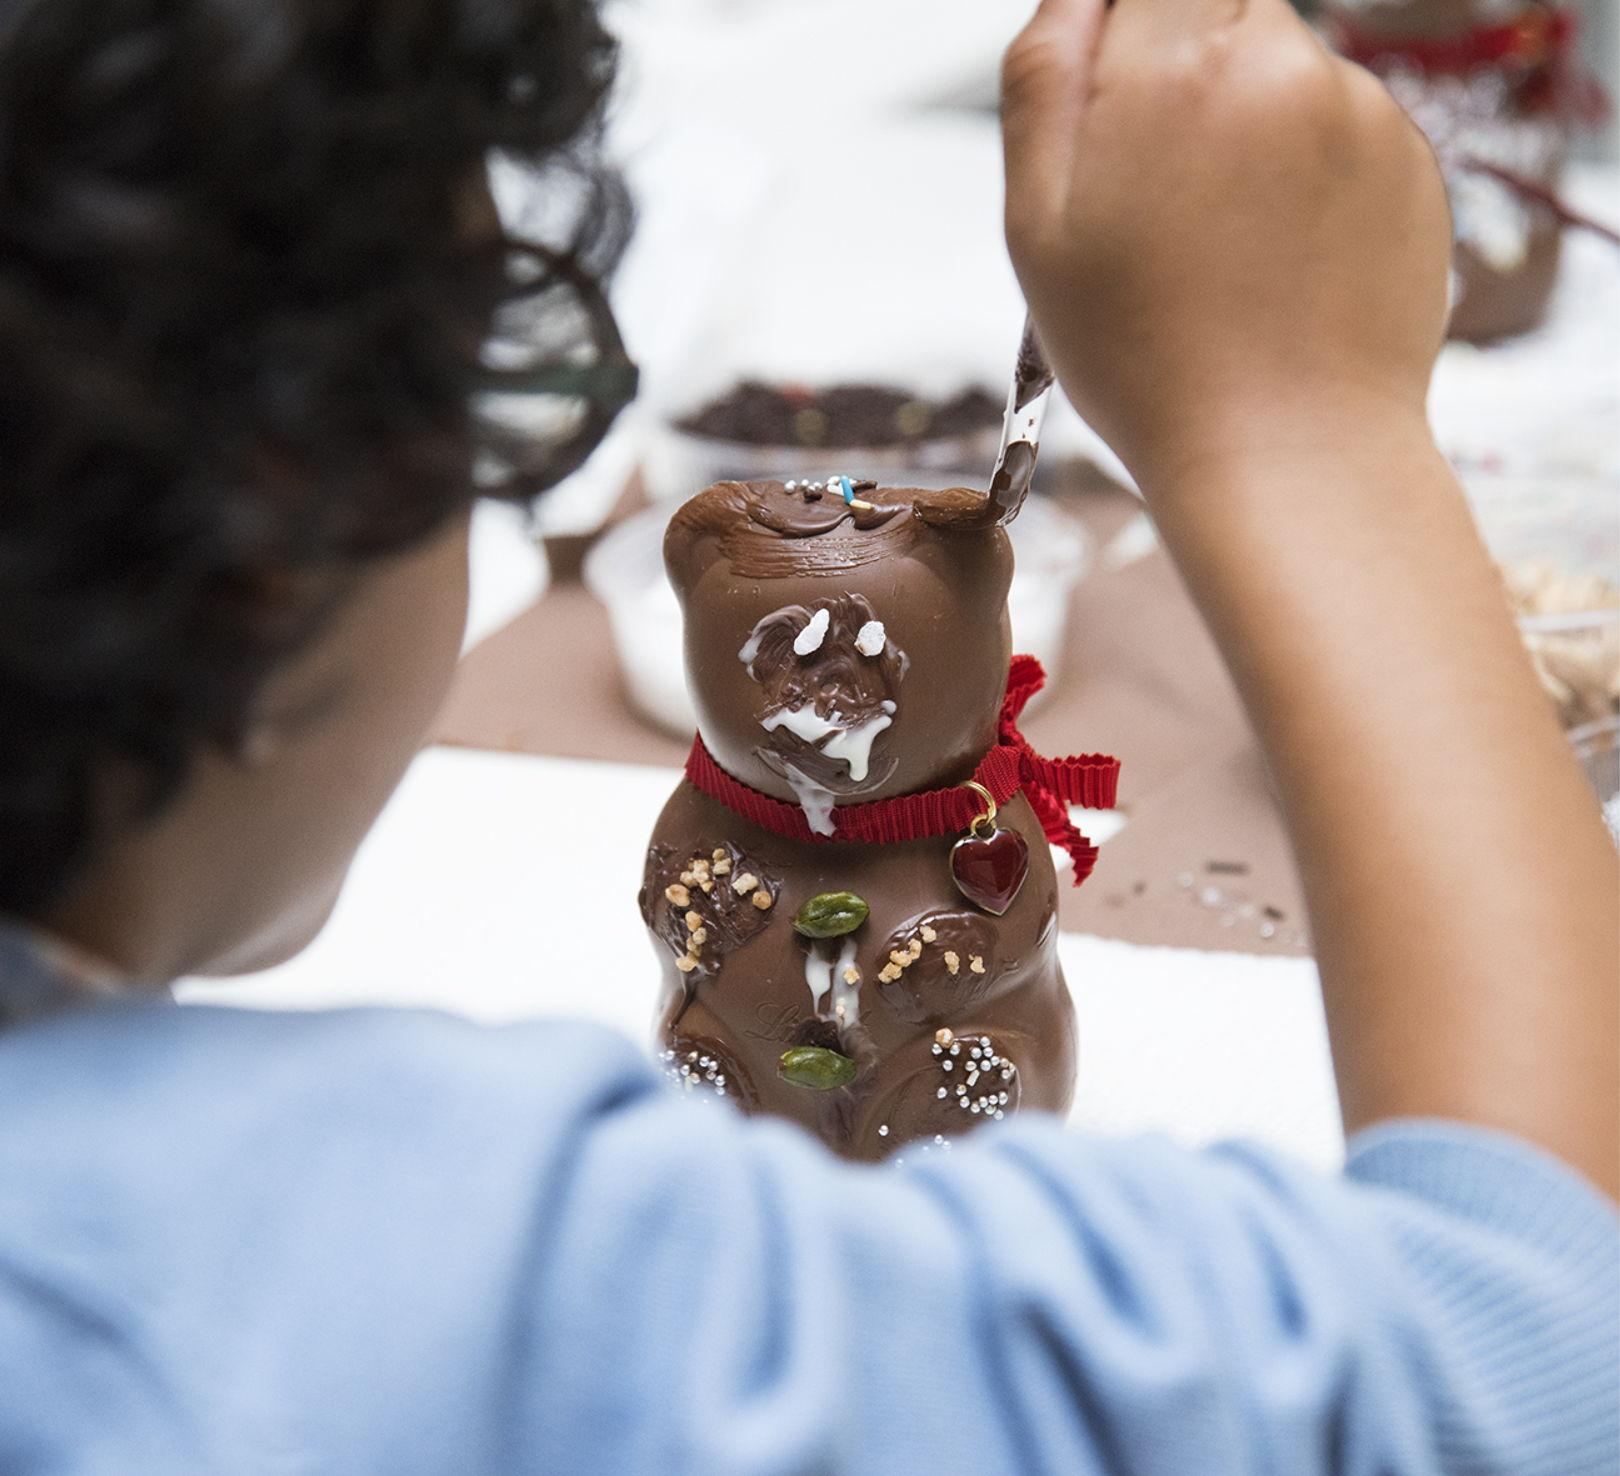 Lindt Schokoladewerkstatt im Kaufhaus Tyrol